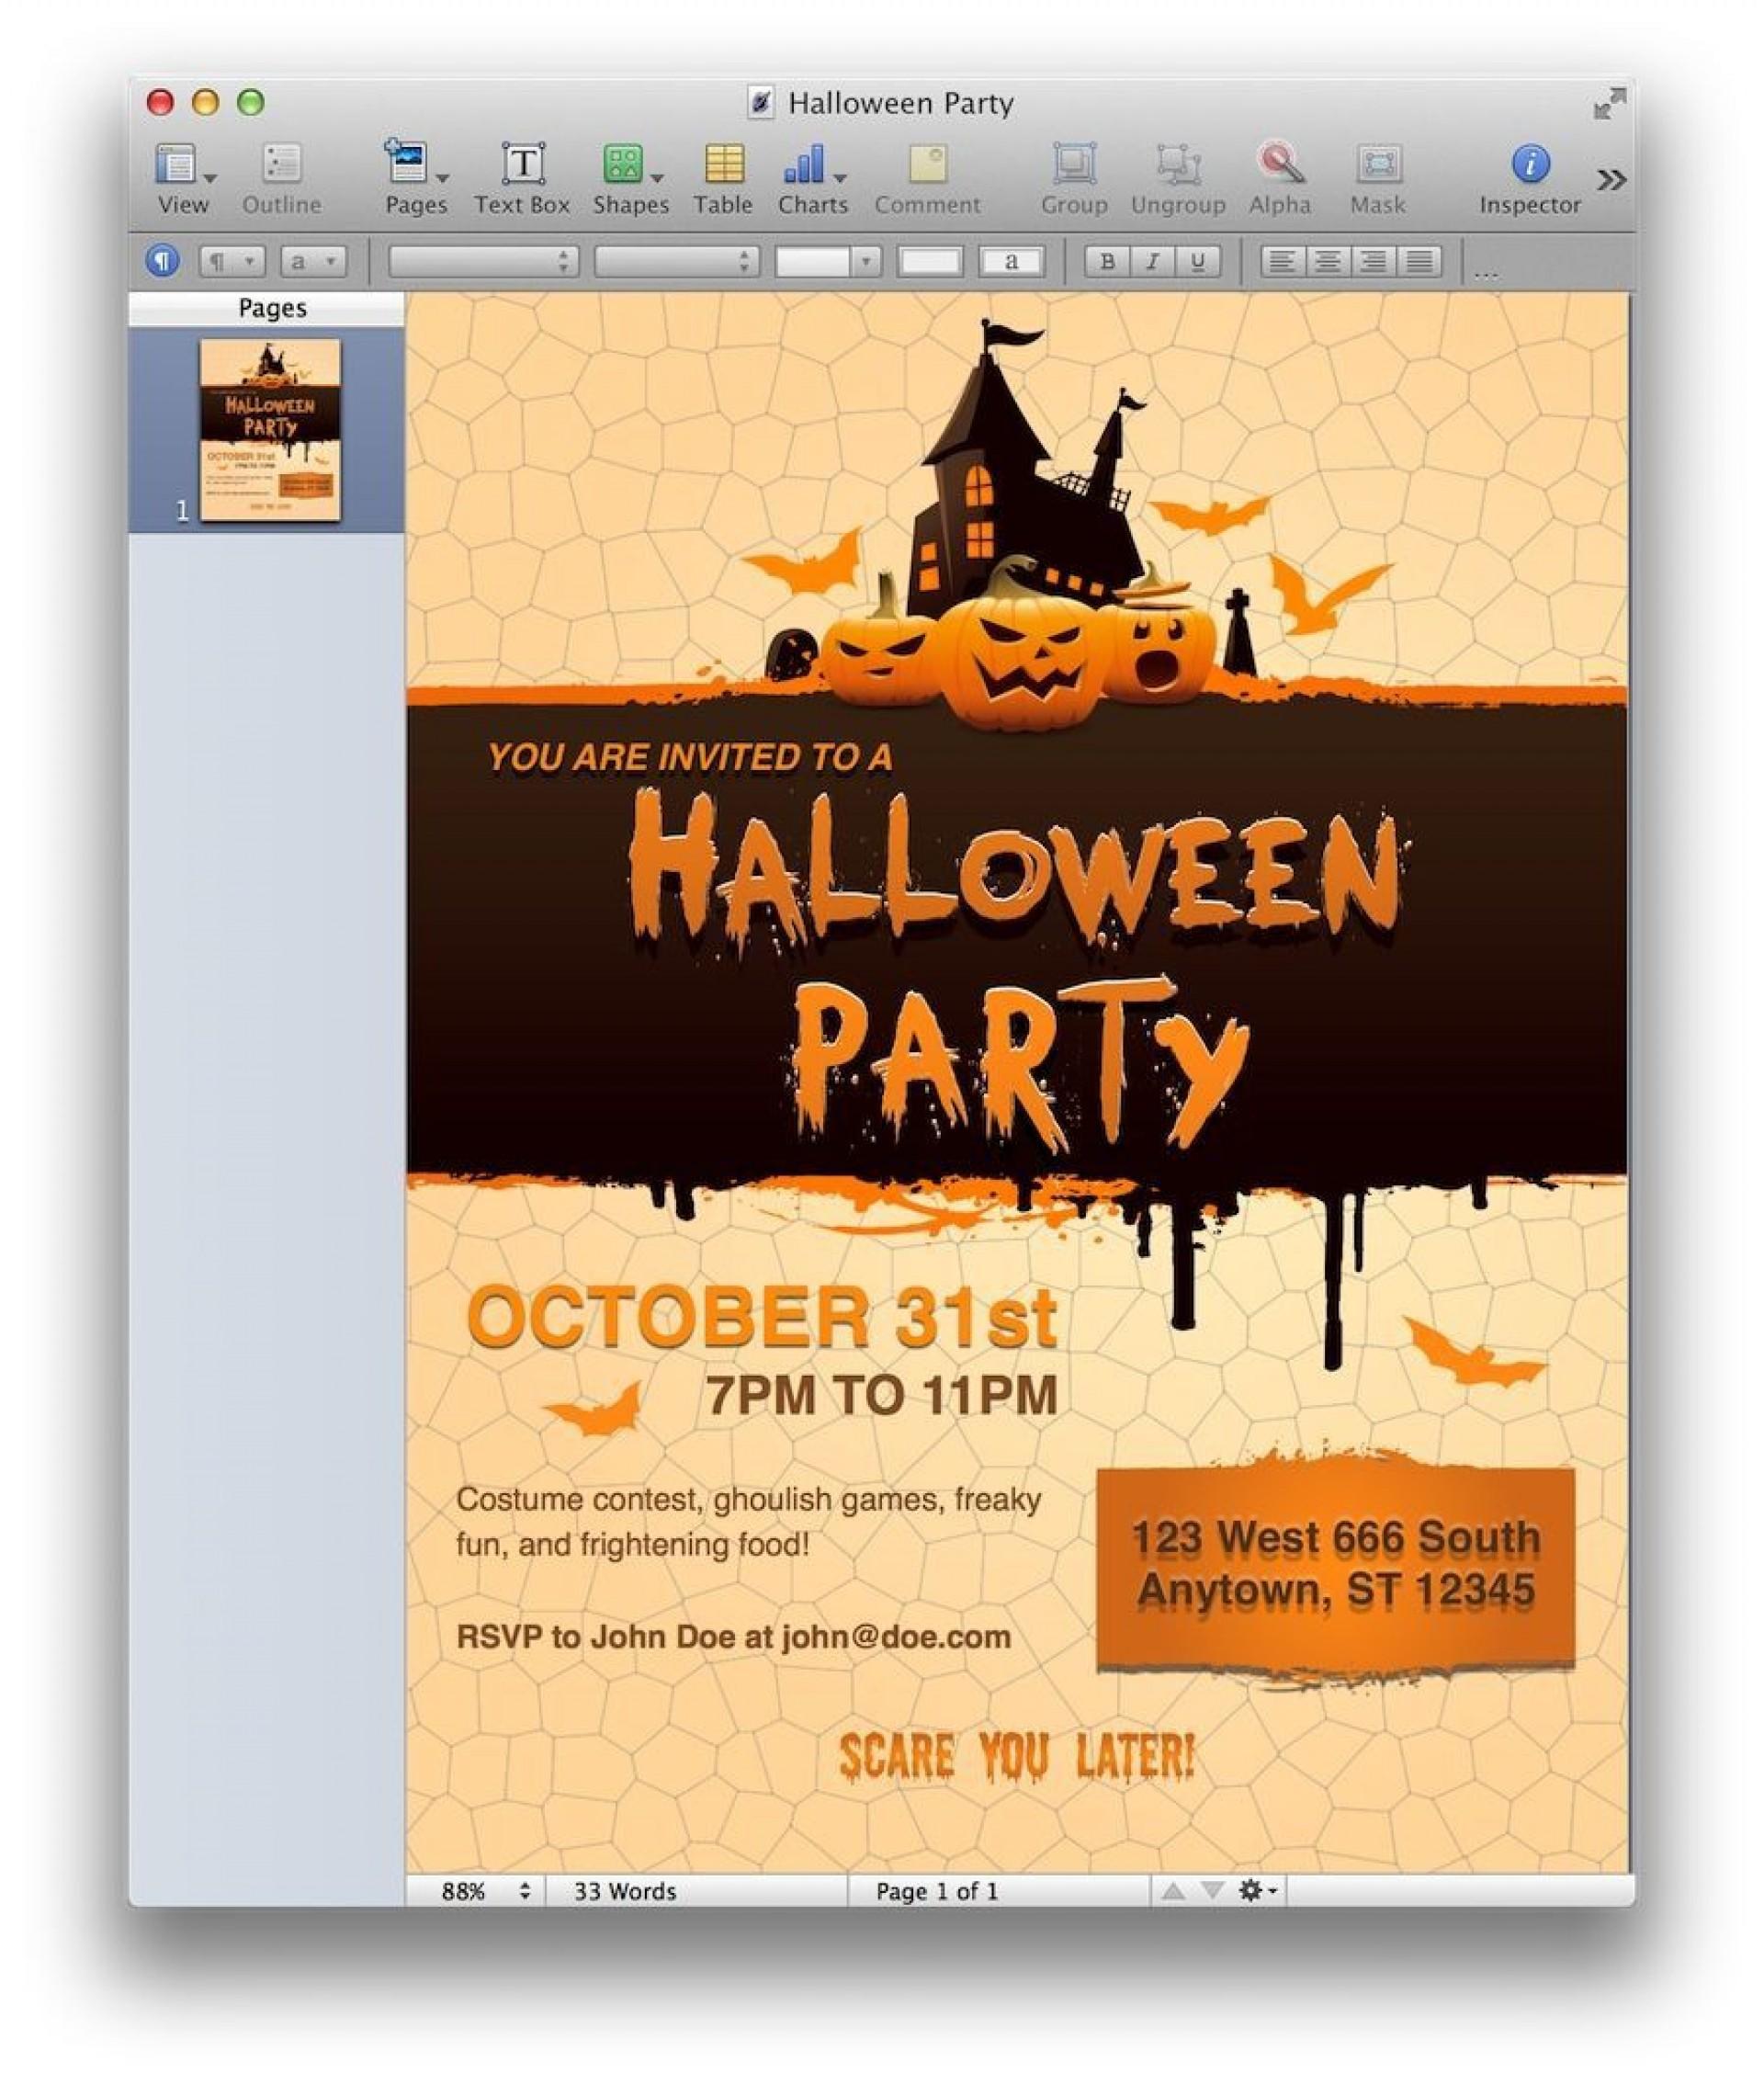 002 Magnificent Halloween Invitation Template Microsoft Word Highest Clarity  Birthday Free1920